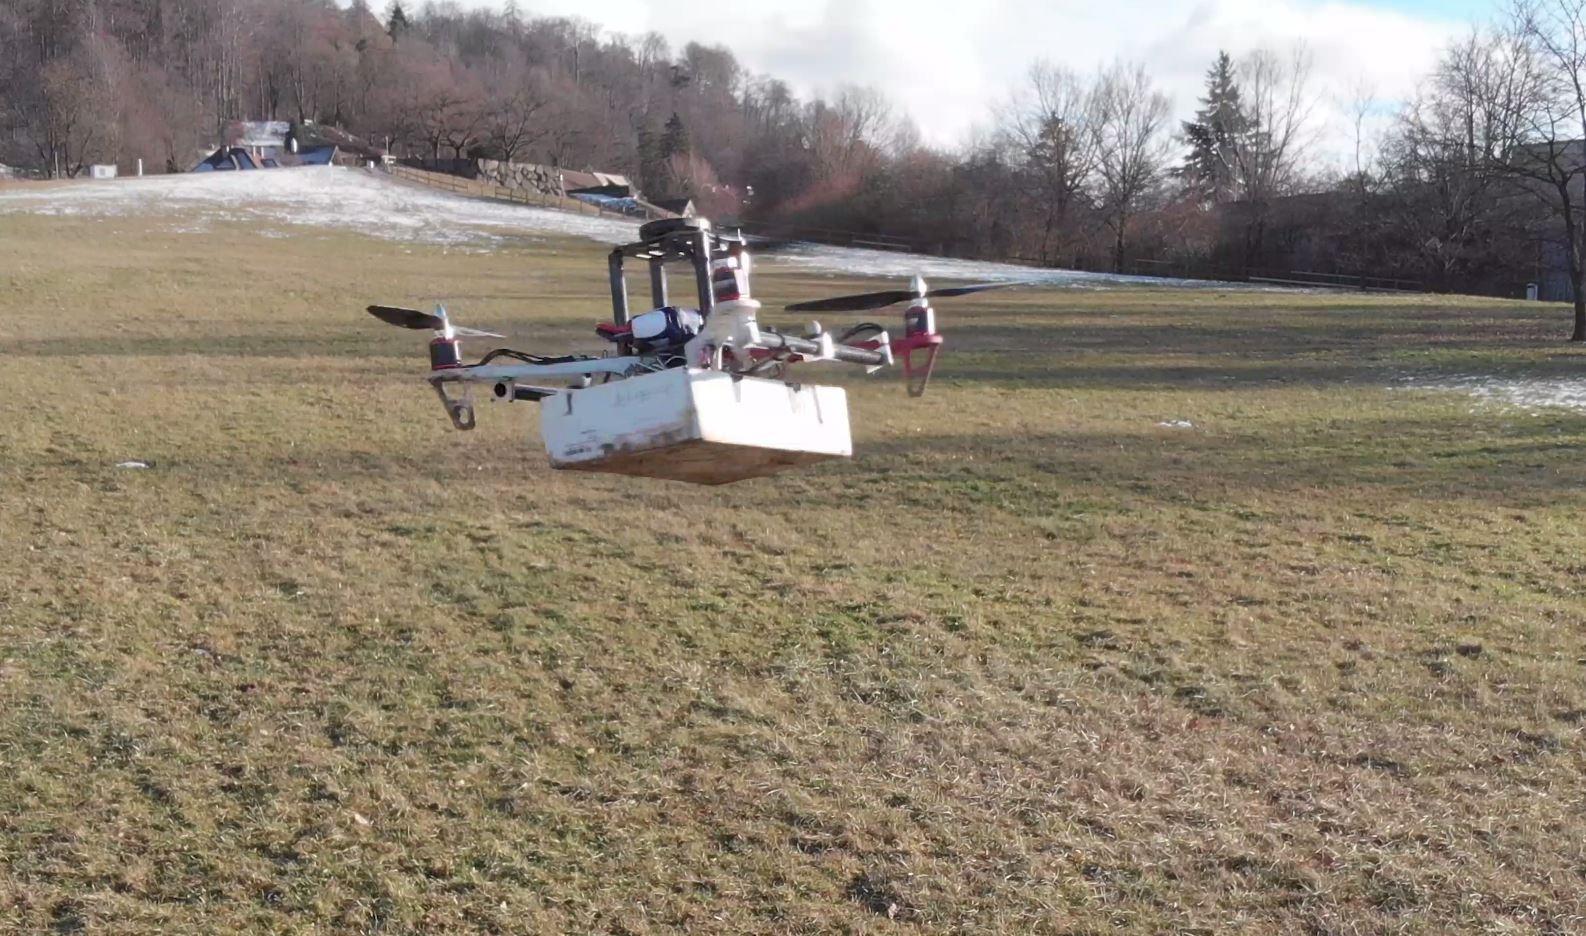 Verity Studios Launches Software Algorithm to Make Drones